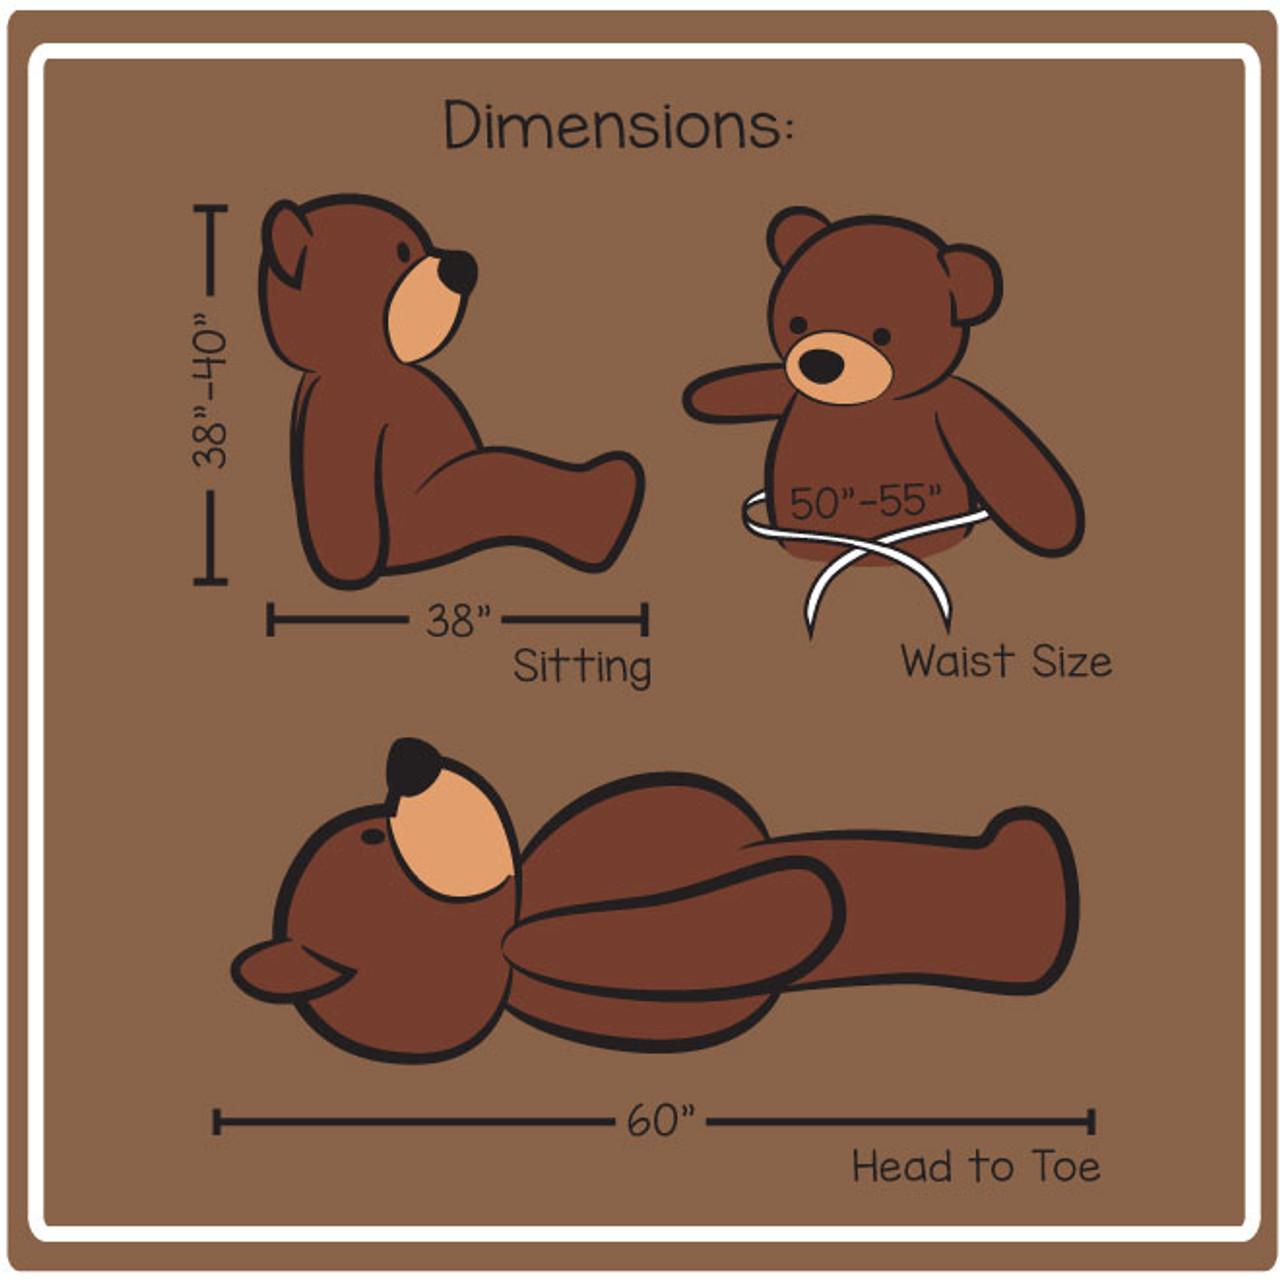 60 in Cuddles Dimensions